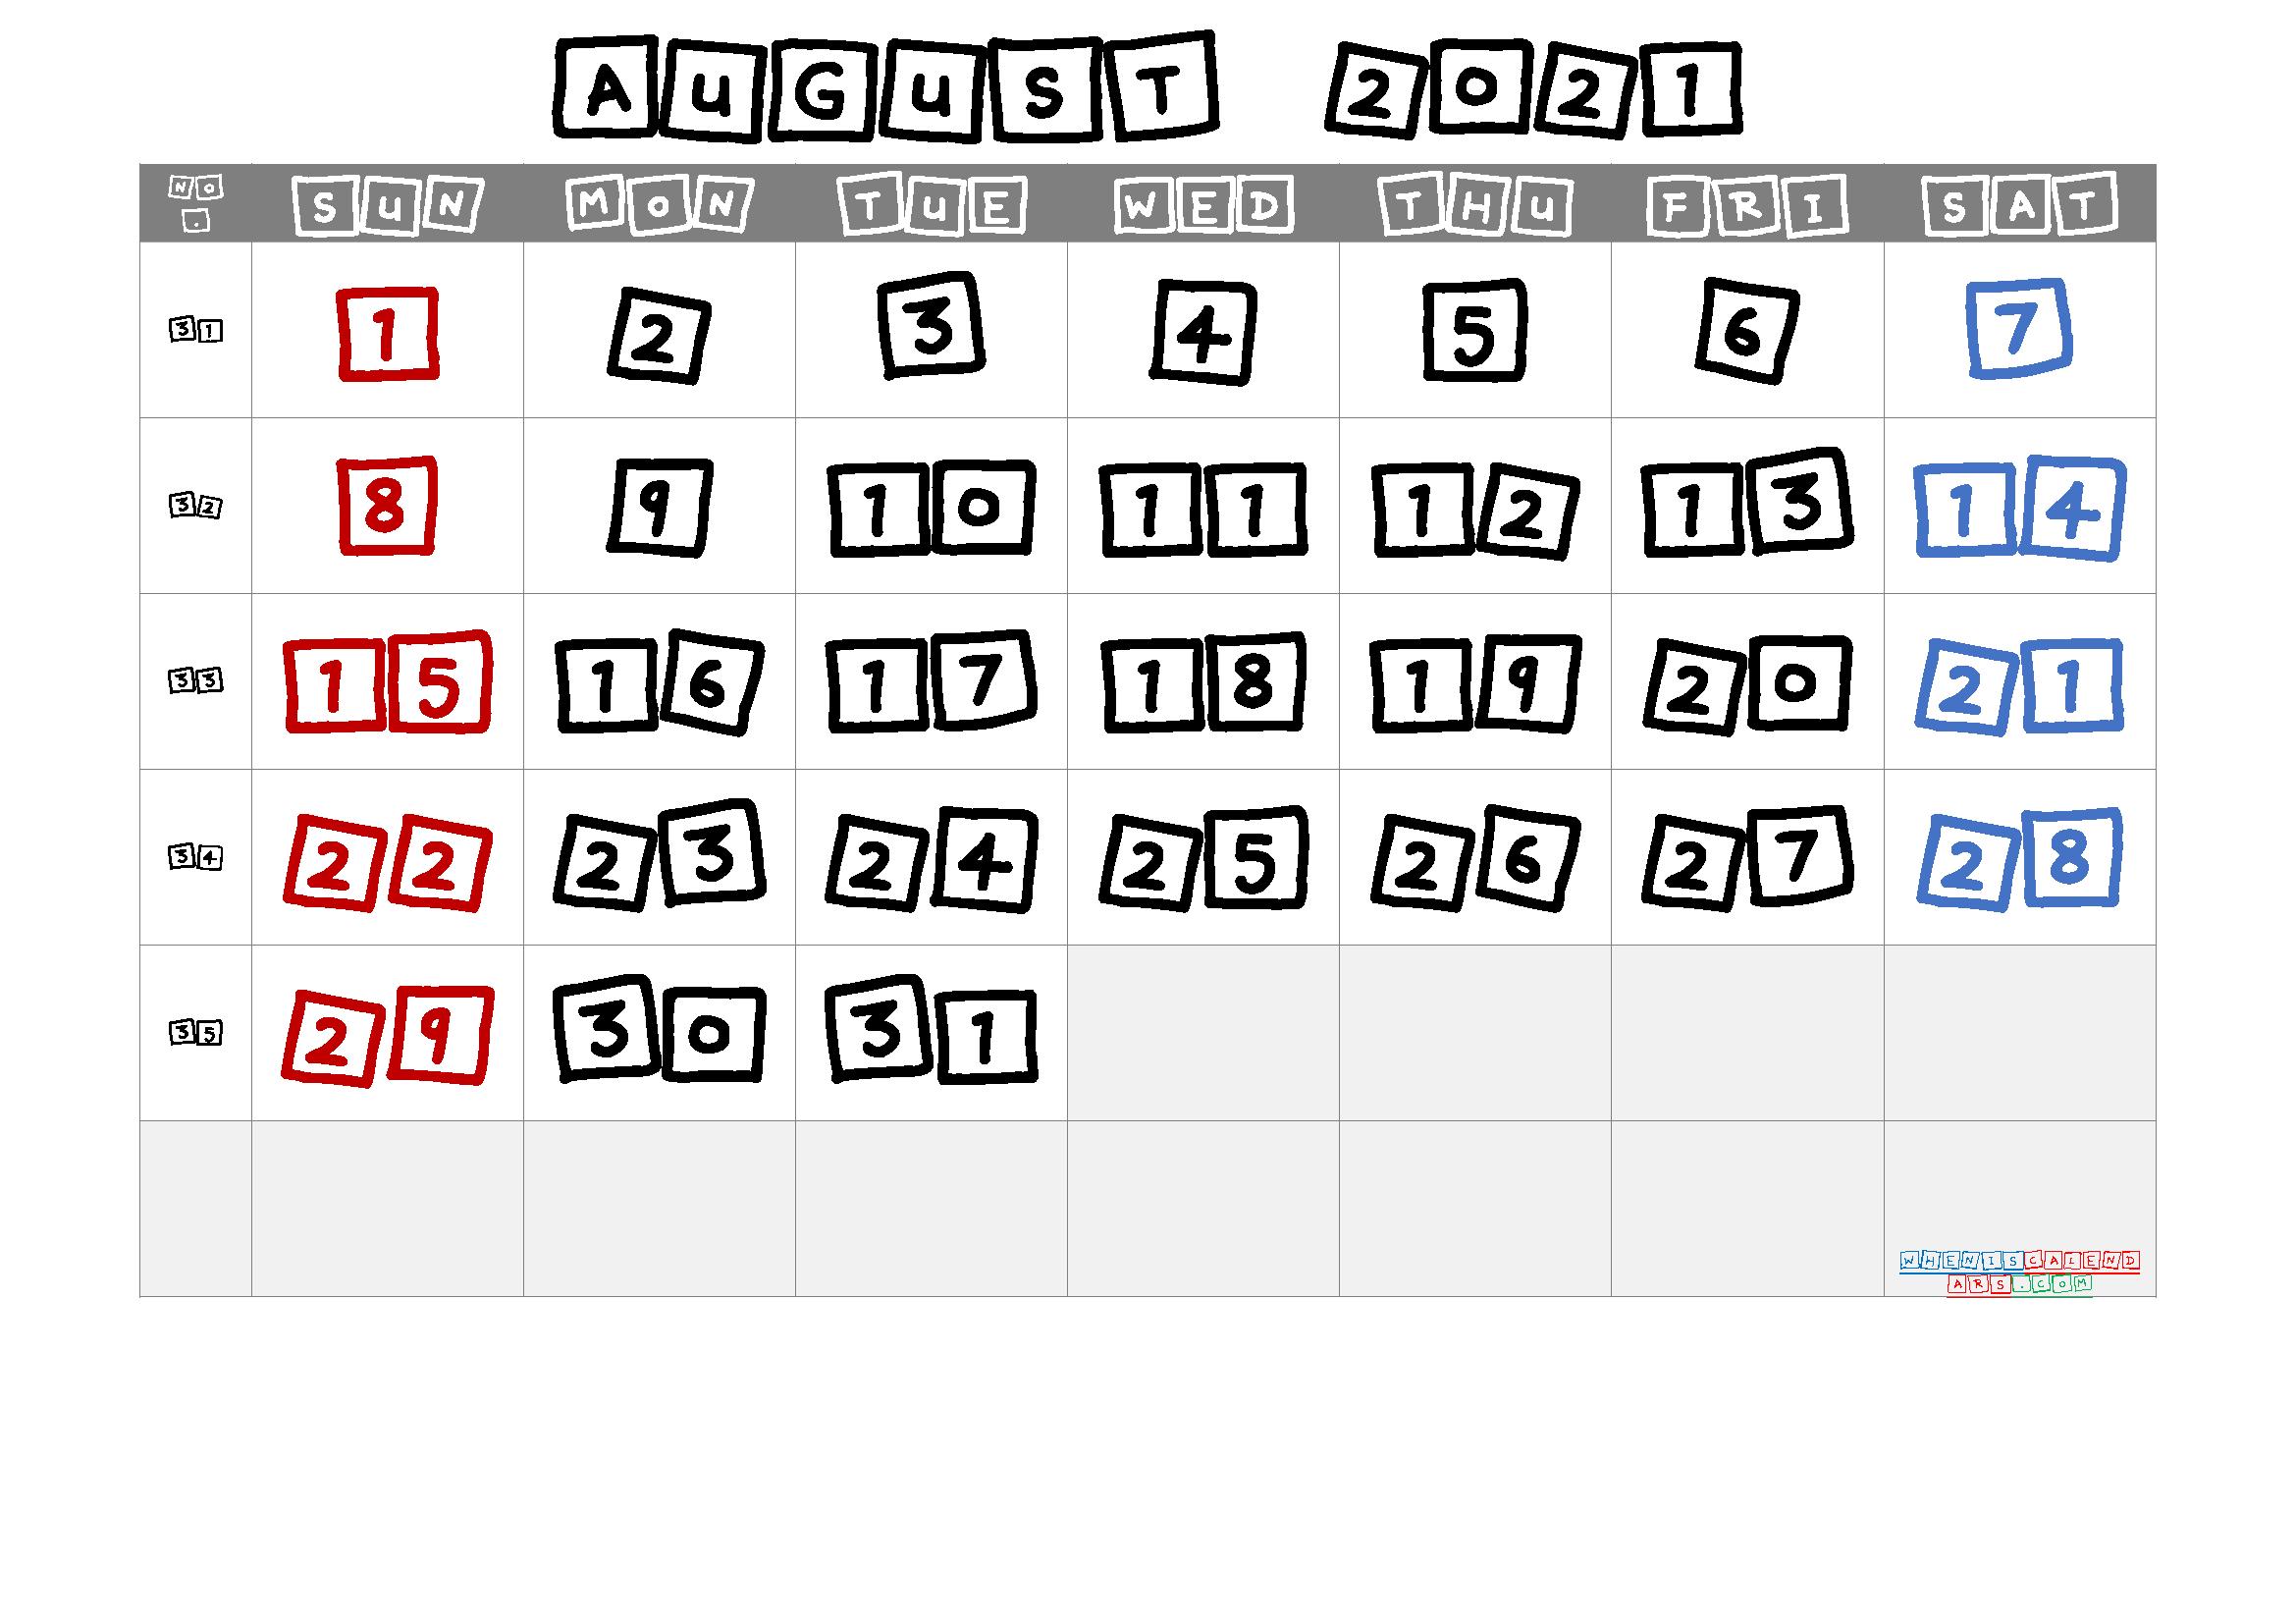 Free Printable August 2021 Calendar Premium In 2020 Calendar Printables June Calendar Printable Free Printable Calendar